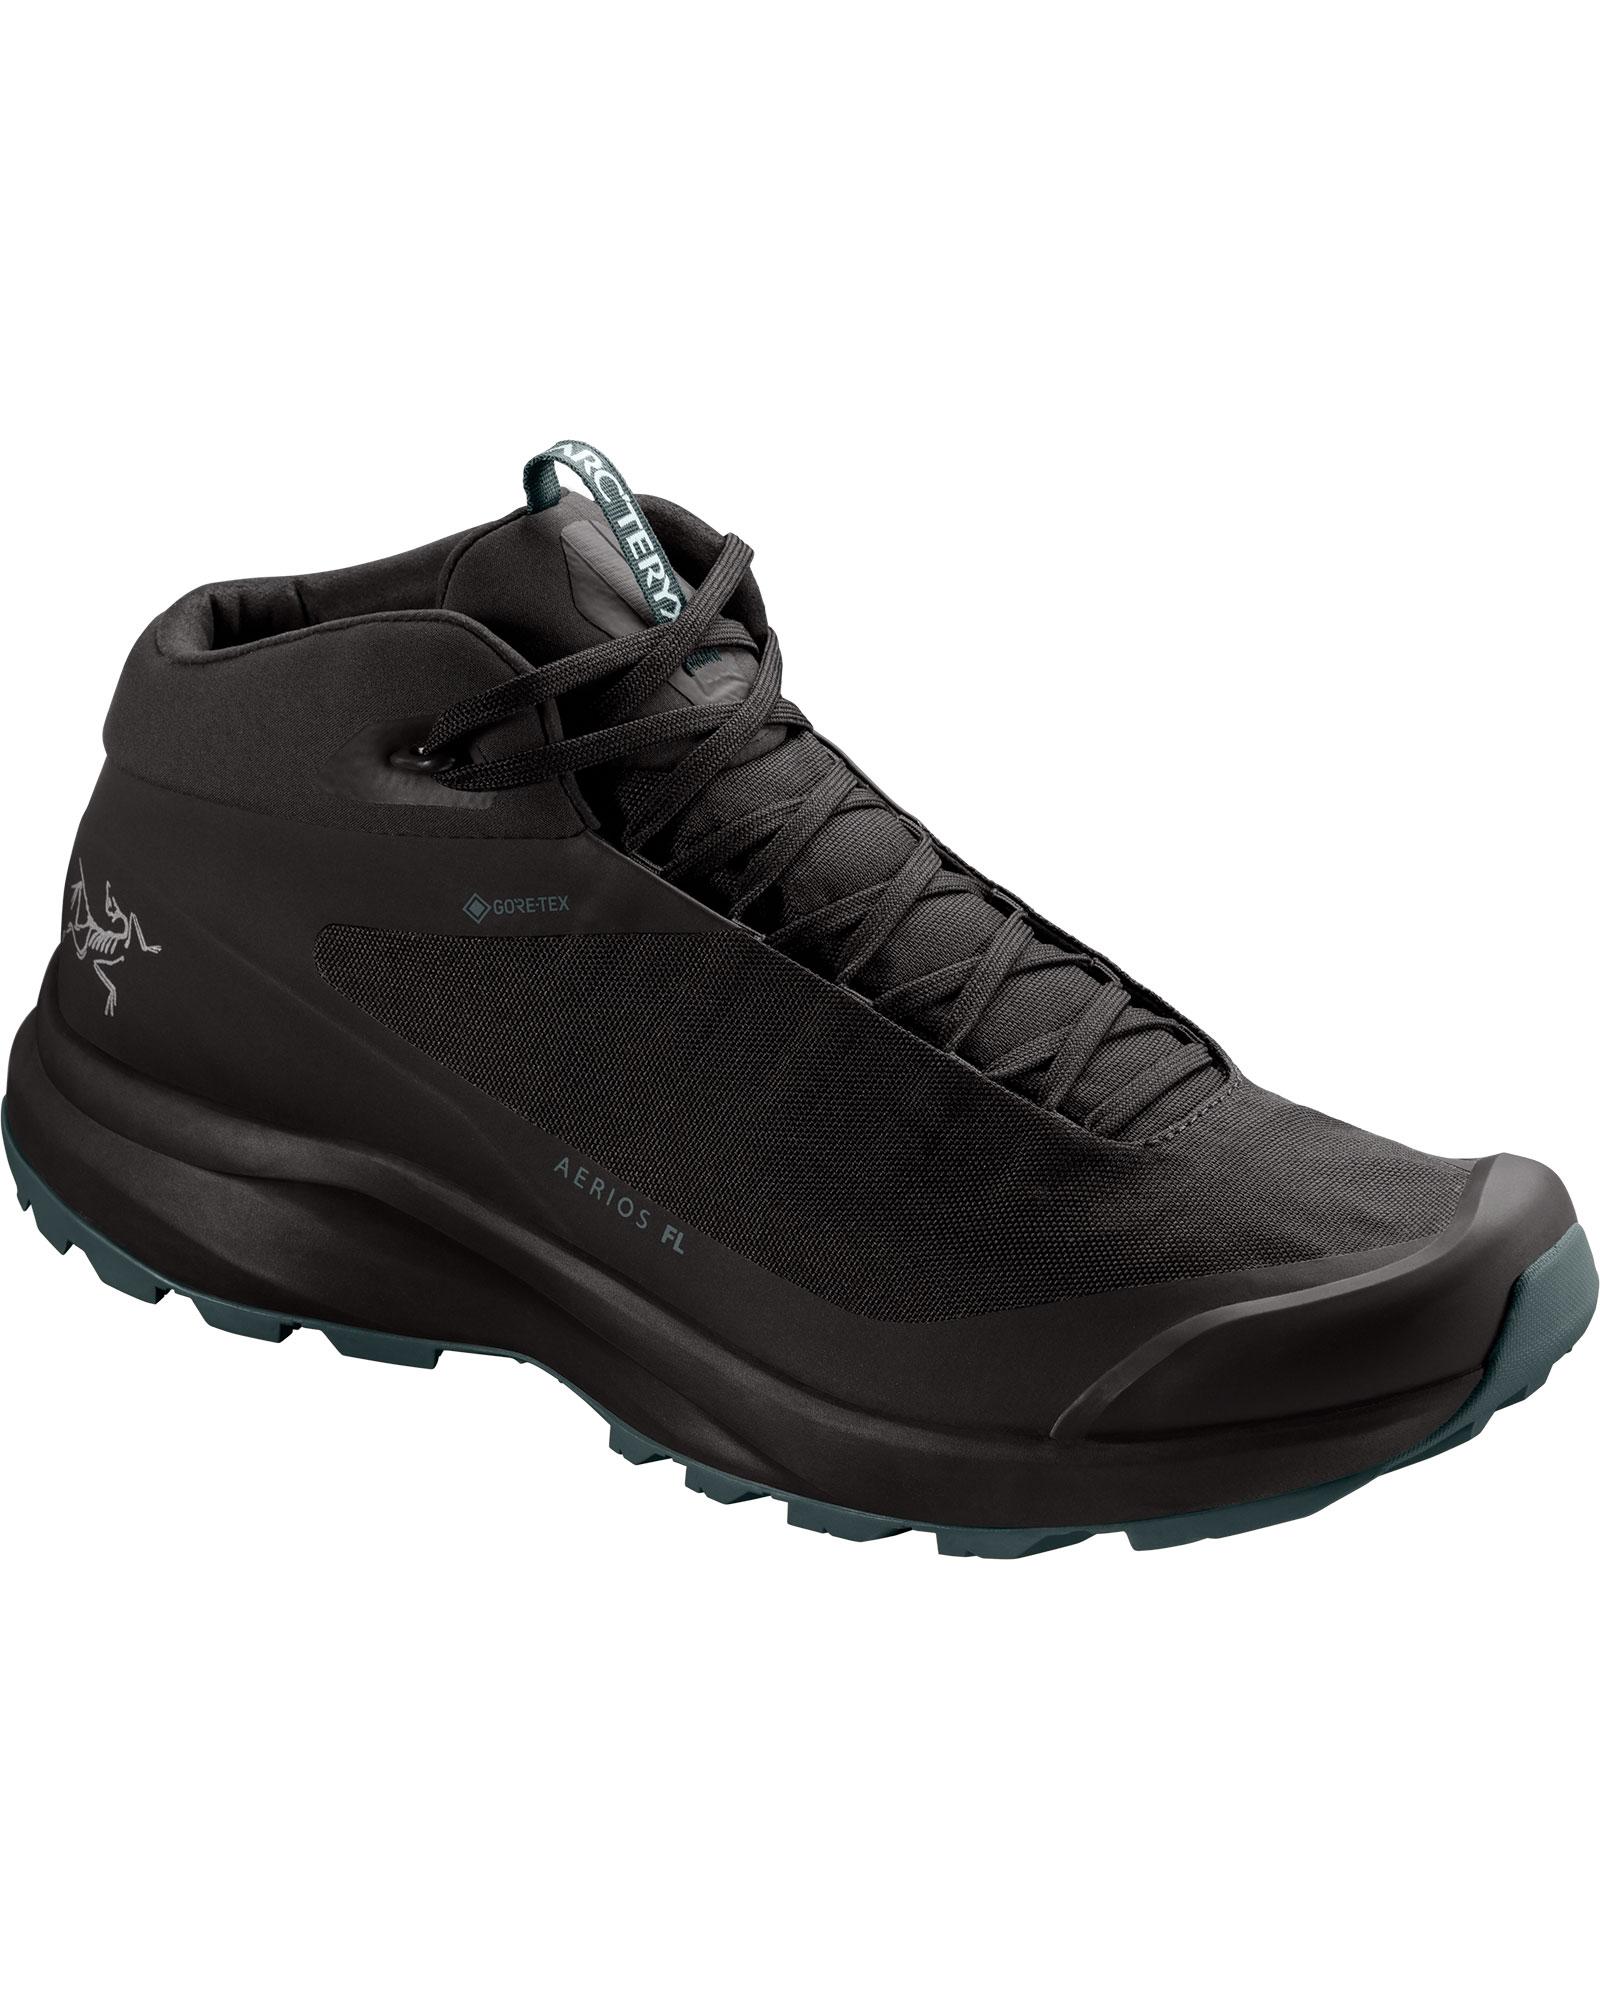 Arc'teryx Men's Aerios FL Mid GORE-TEX Walking Boots 0